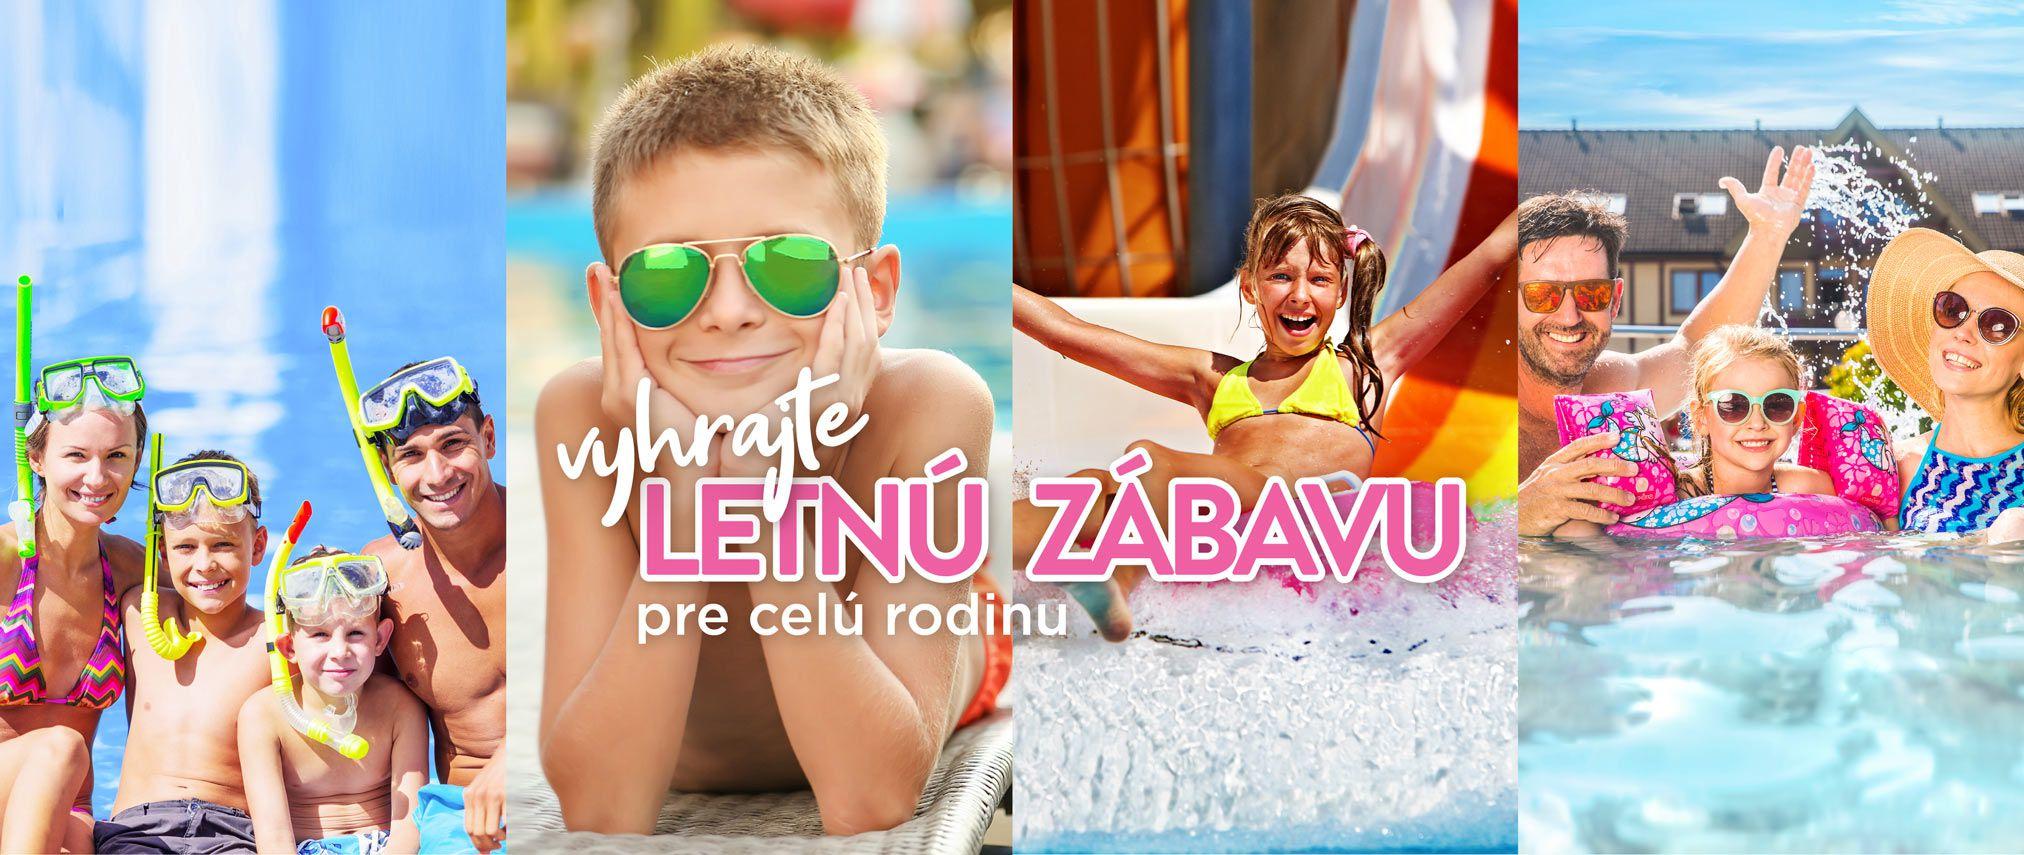 summer promo besenova